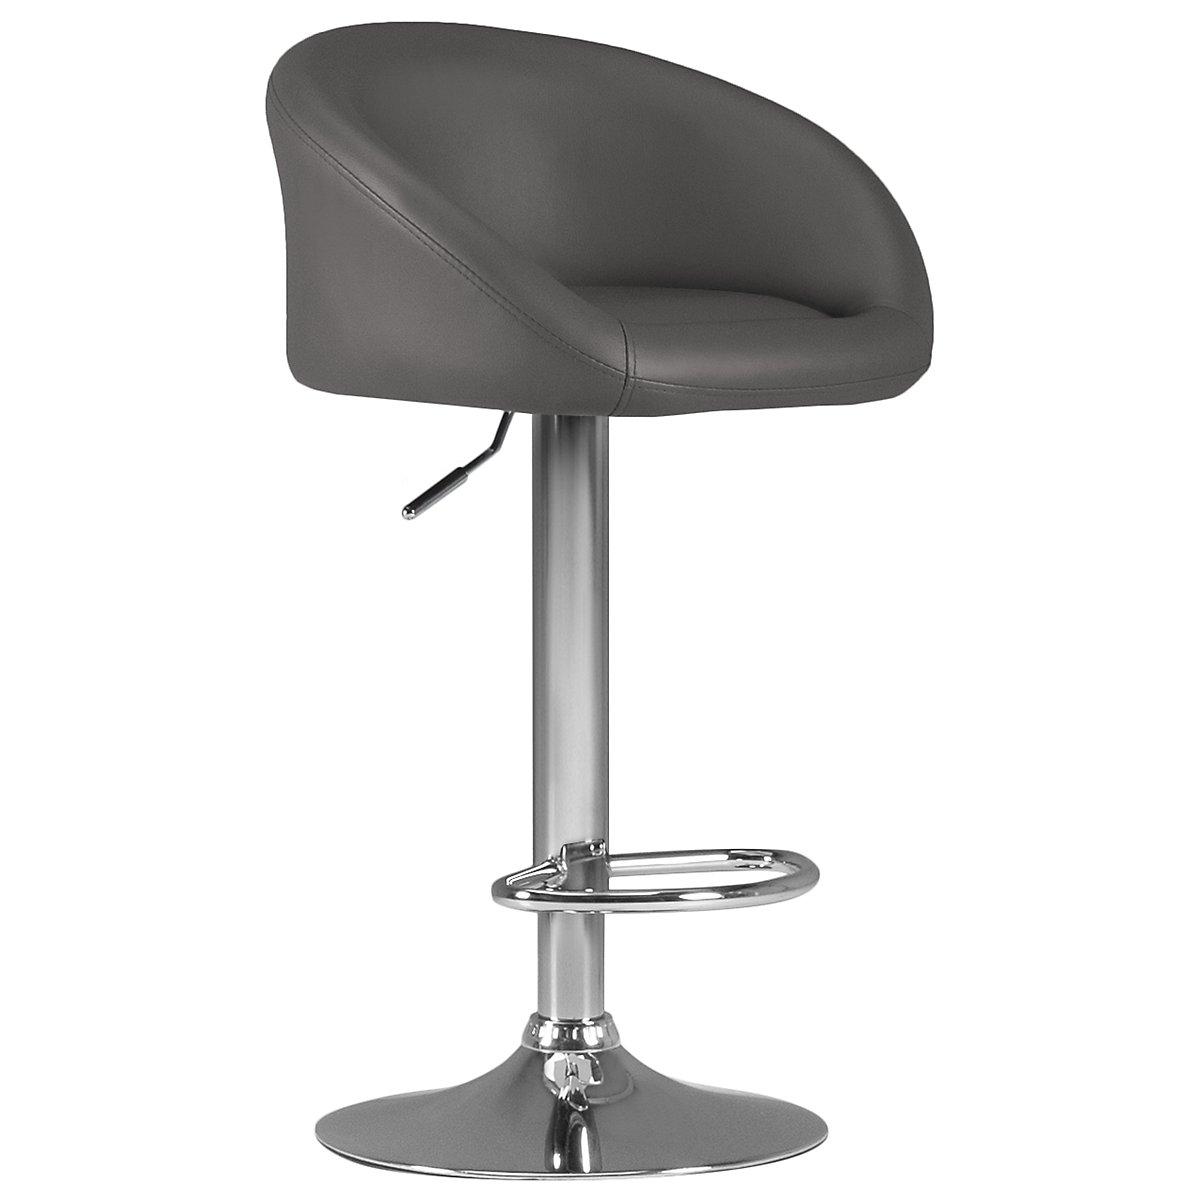 City Furniture Dayton Gray Upholstered Adjustable Stool